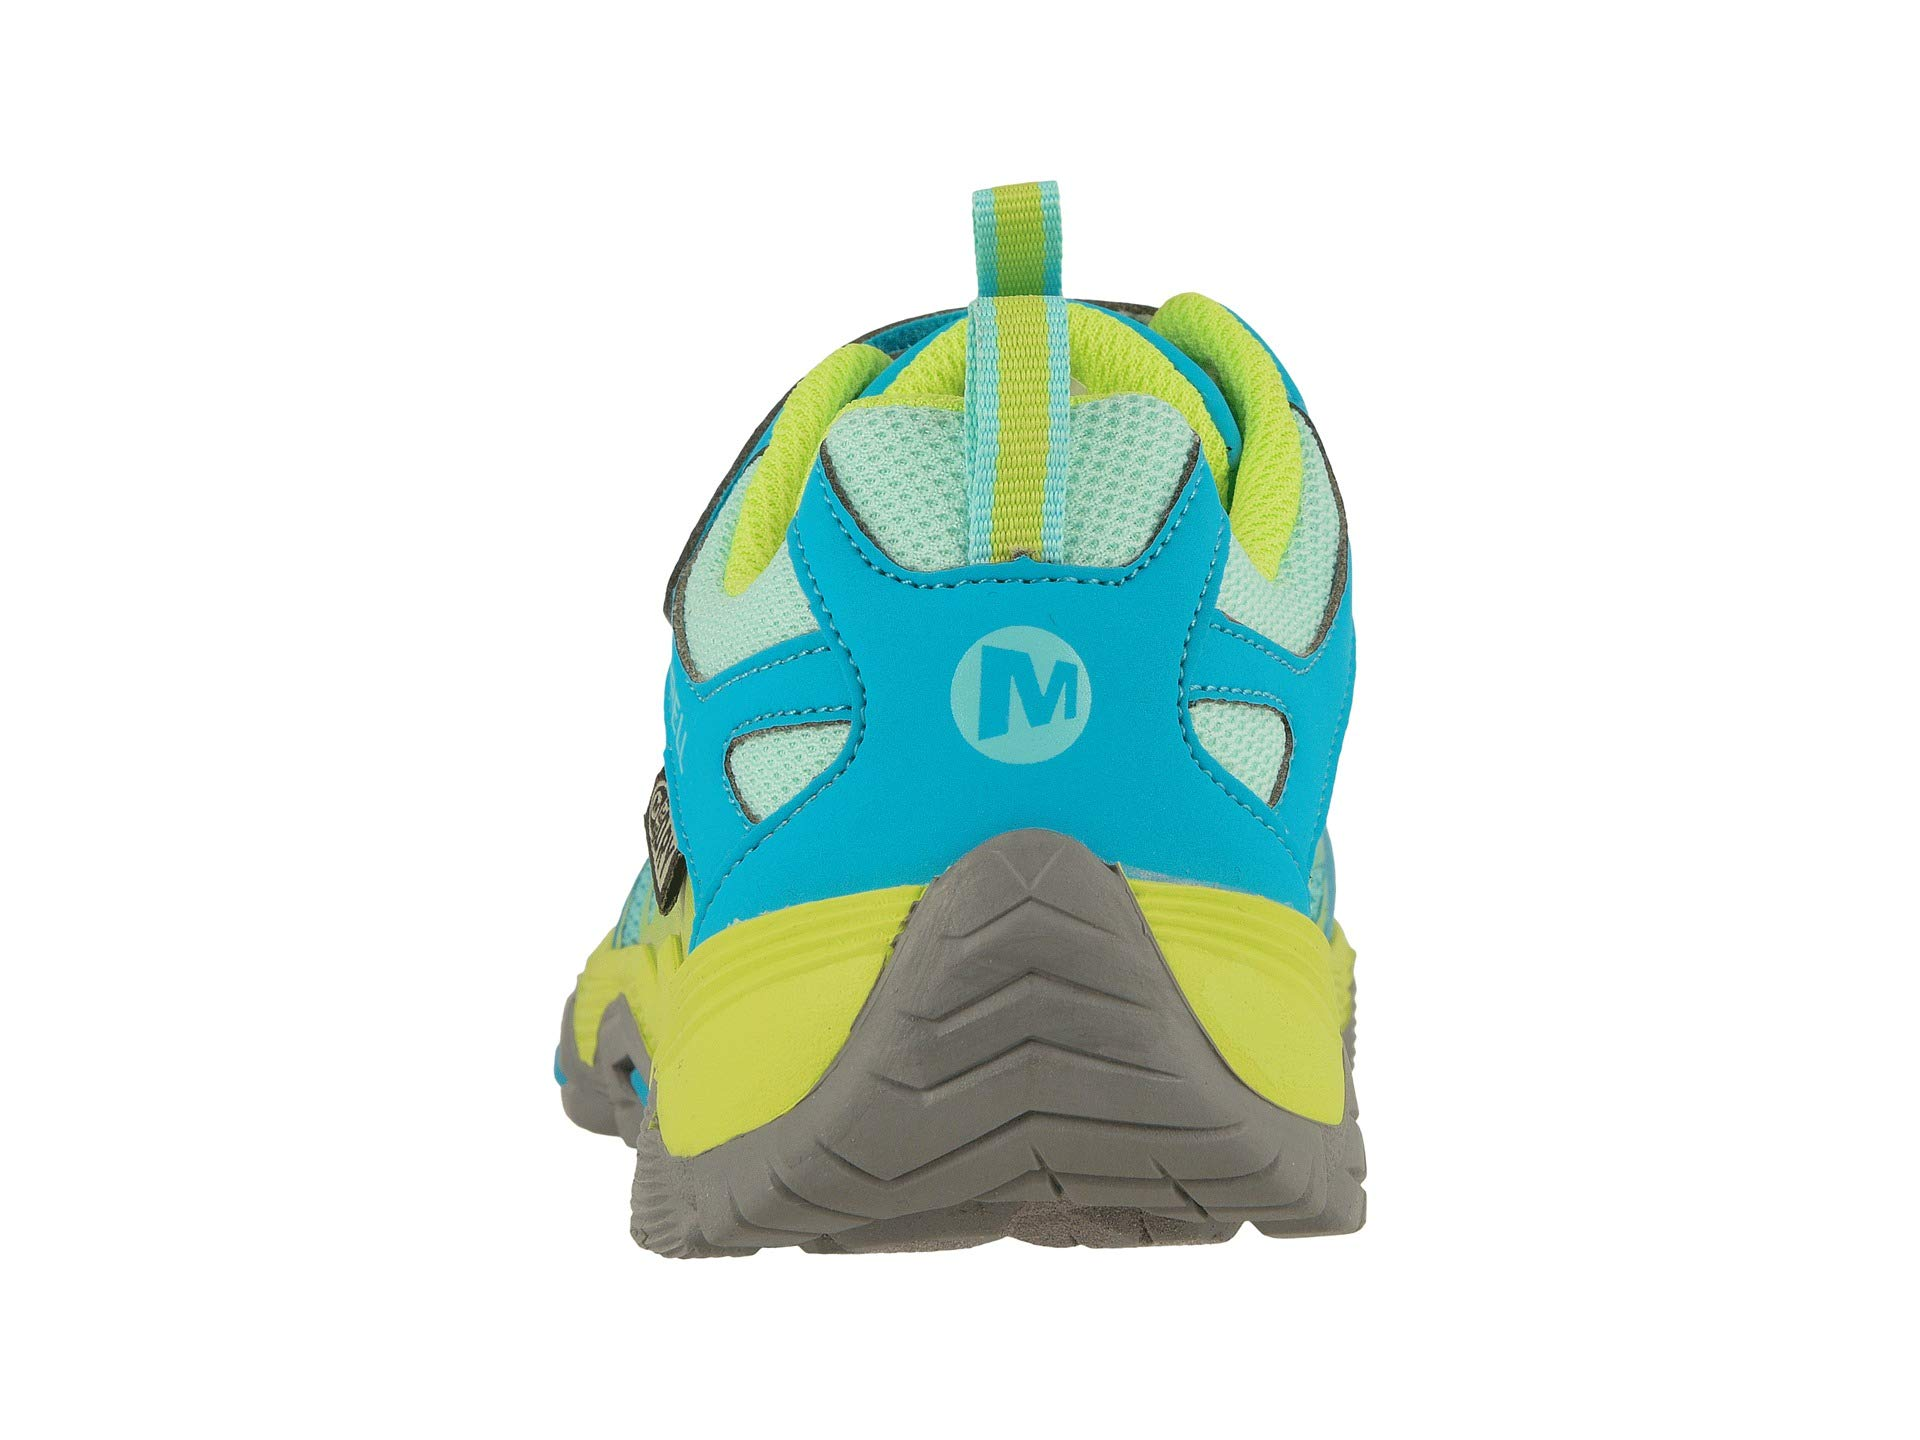 Merrell Girls' Moab FST Low A/C WTRPF Hiking Shoe, Turq/Lime, 13.5 M US Little Kid by Merrell (Image #3)